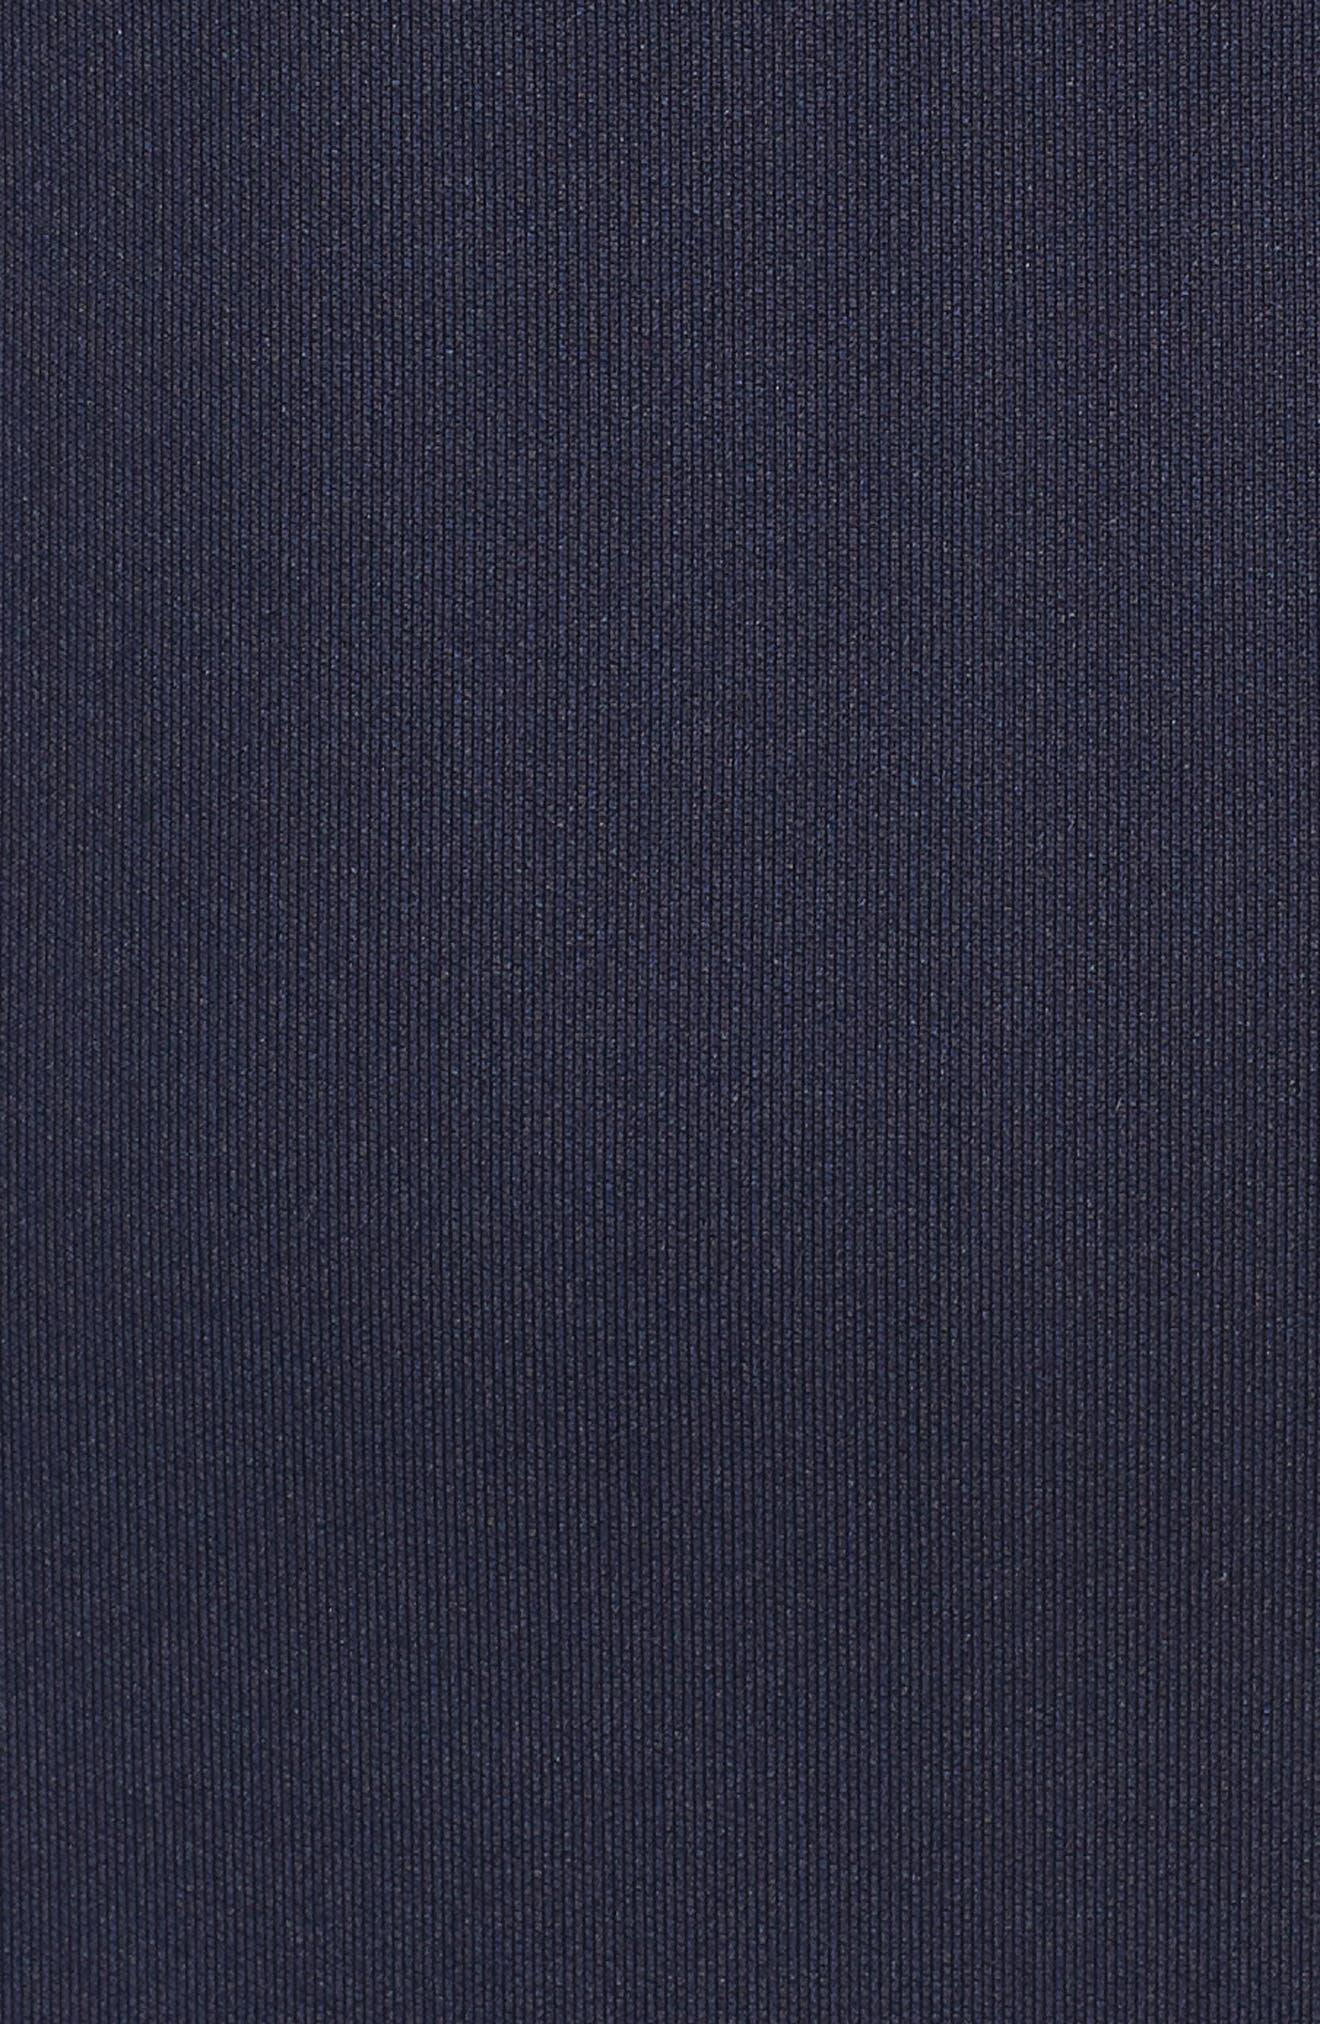 One-Shoulder Ruffle Sheath Dress,                             Alternate thumbnail 6, color,                             410